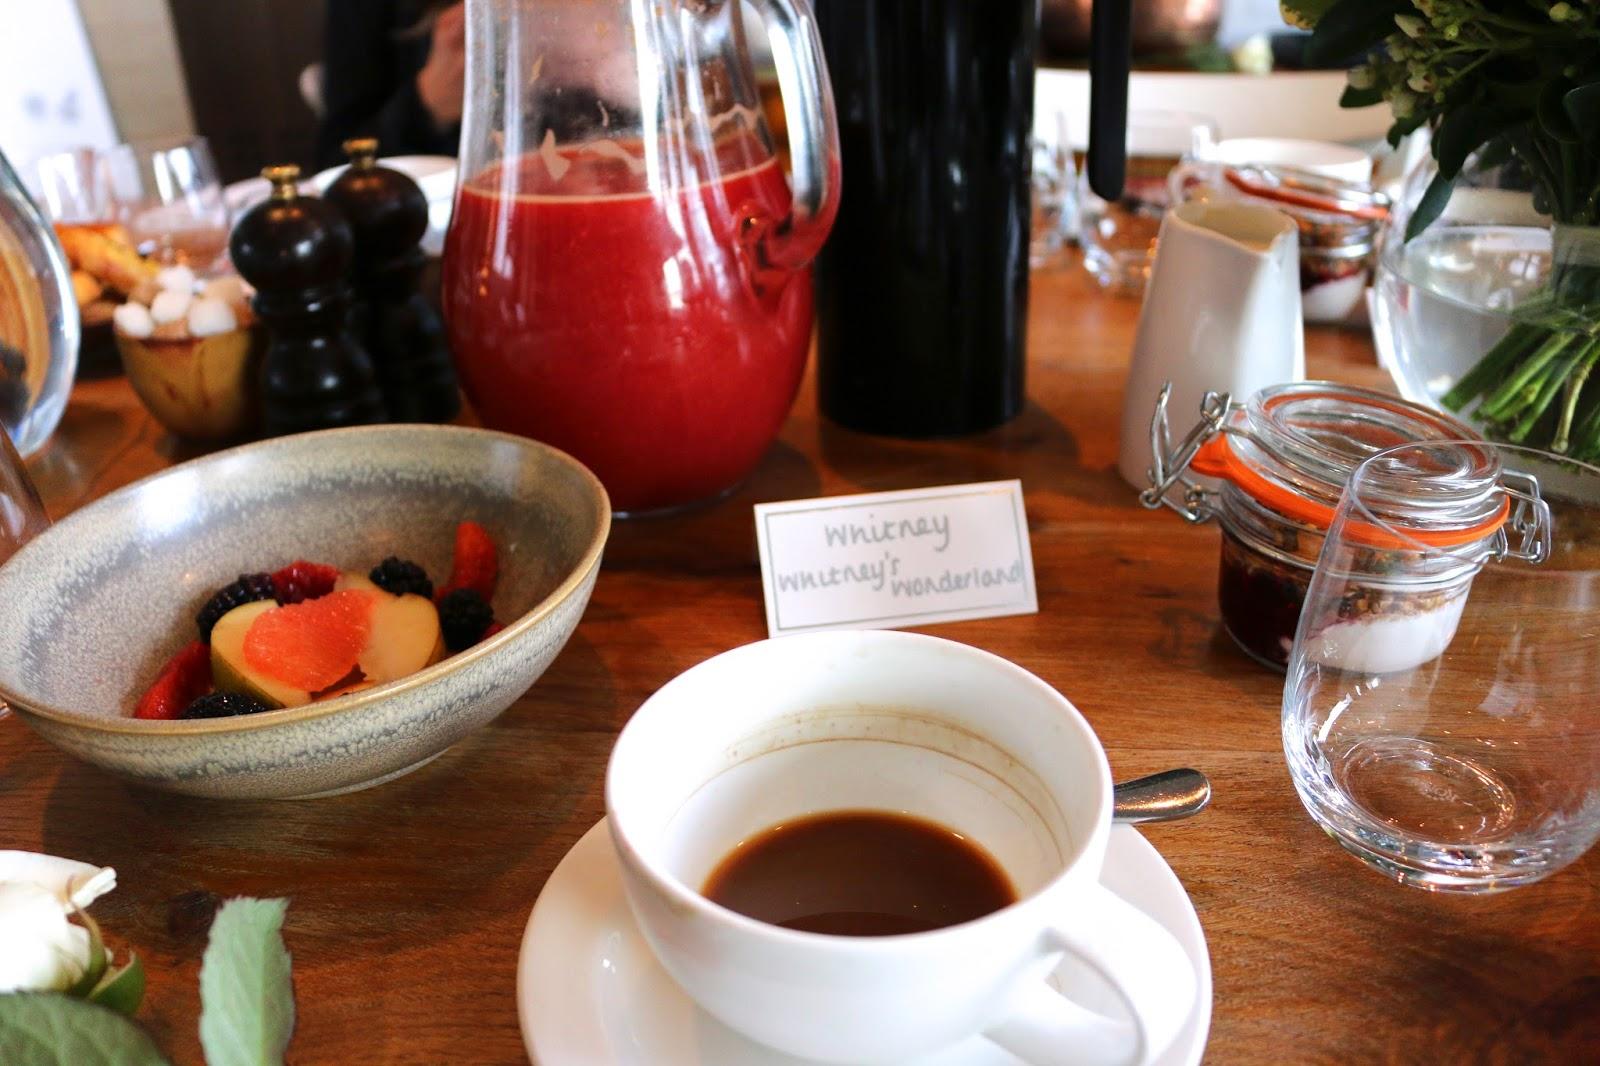 http://www.whitneyswonderland.com/2015/05/breakfast-at-duck-waffle-with-vashi.html